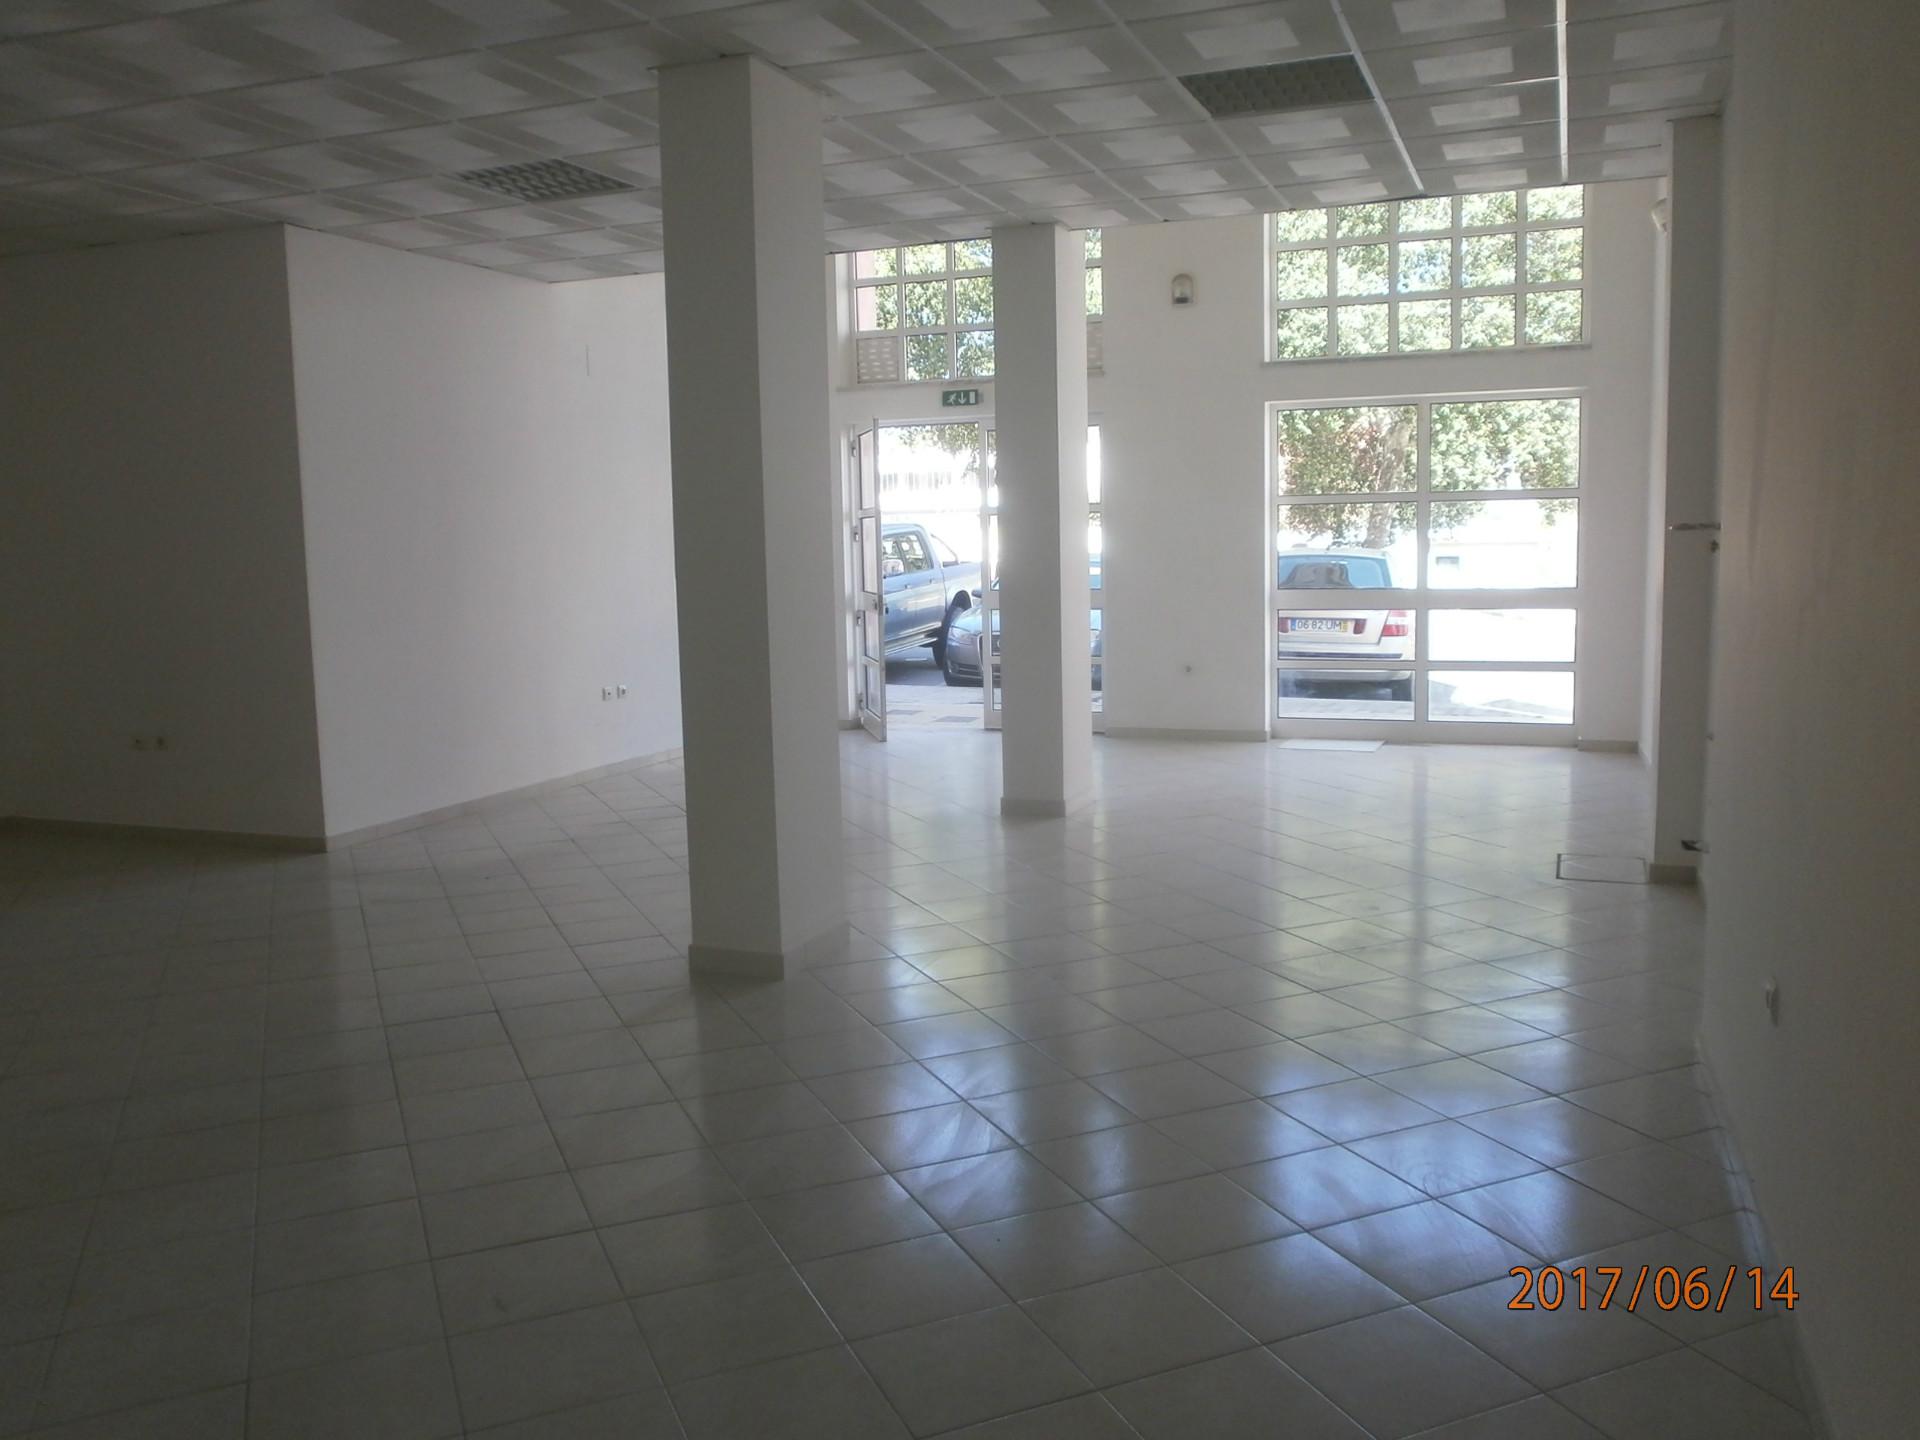 Venda loja 136m2 dois wc, Castelo Branco, Castelo Branco